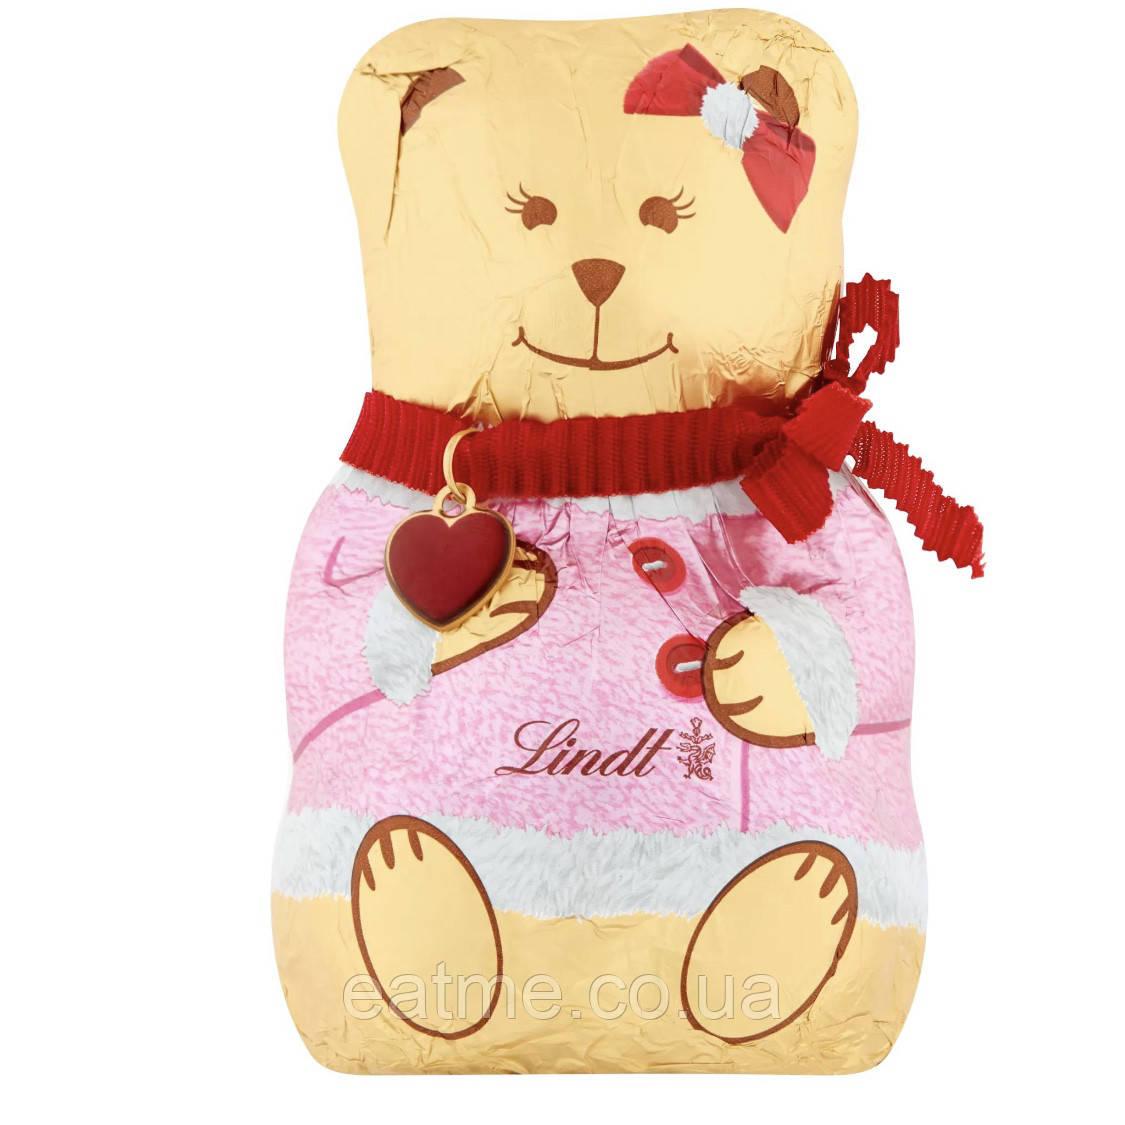 Lindt Шоколадная медведица